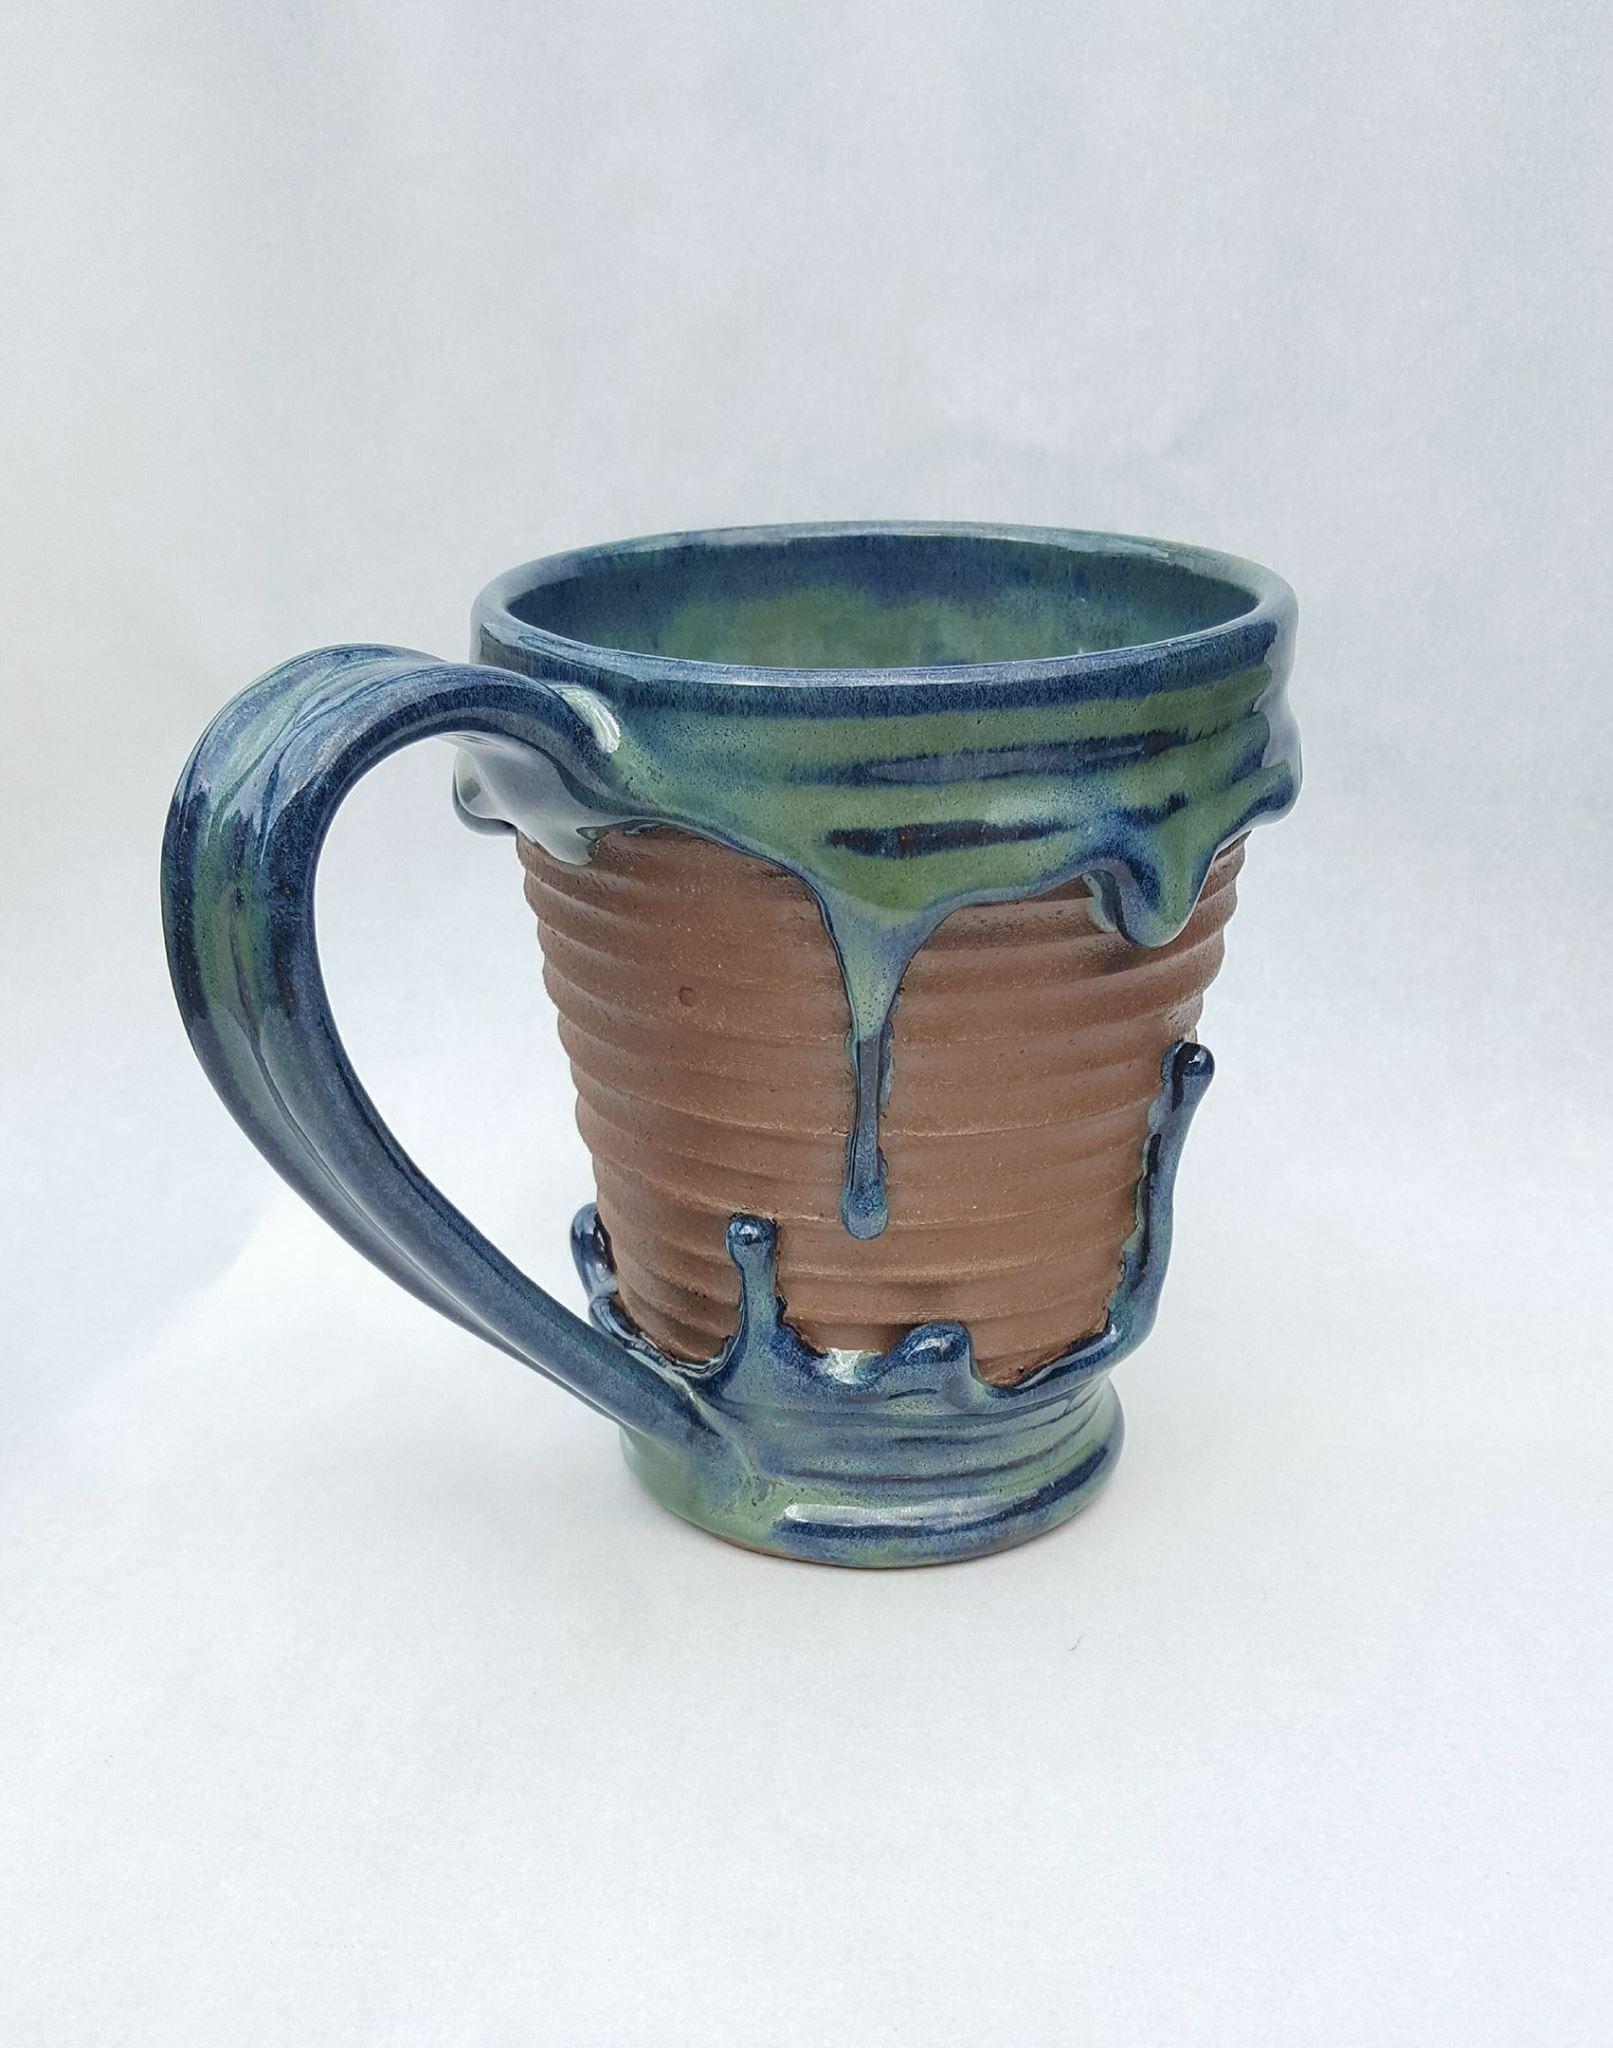 Pottery Decoration Ideas - Home Decorating Ideas